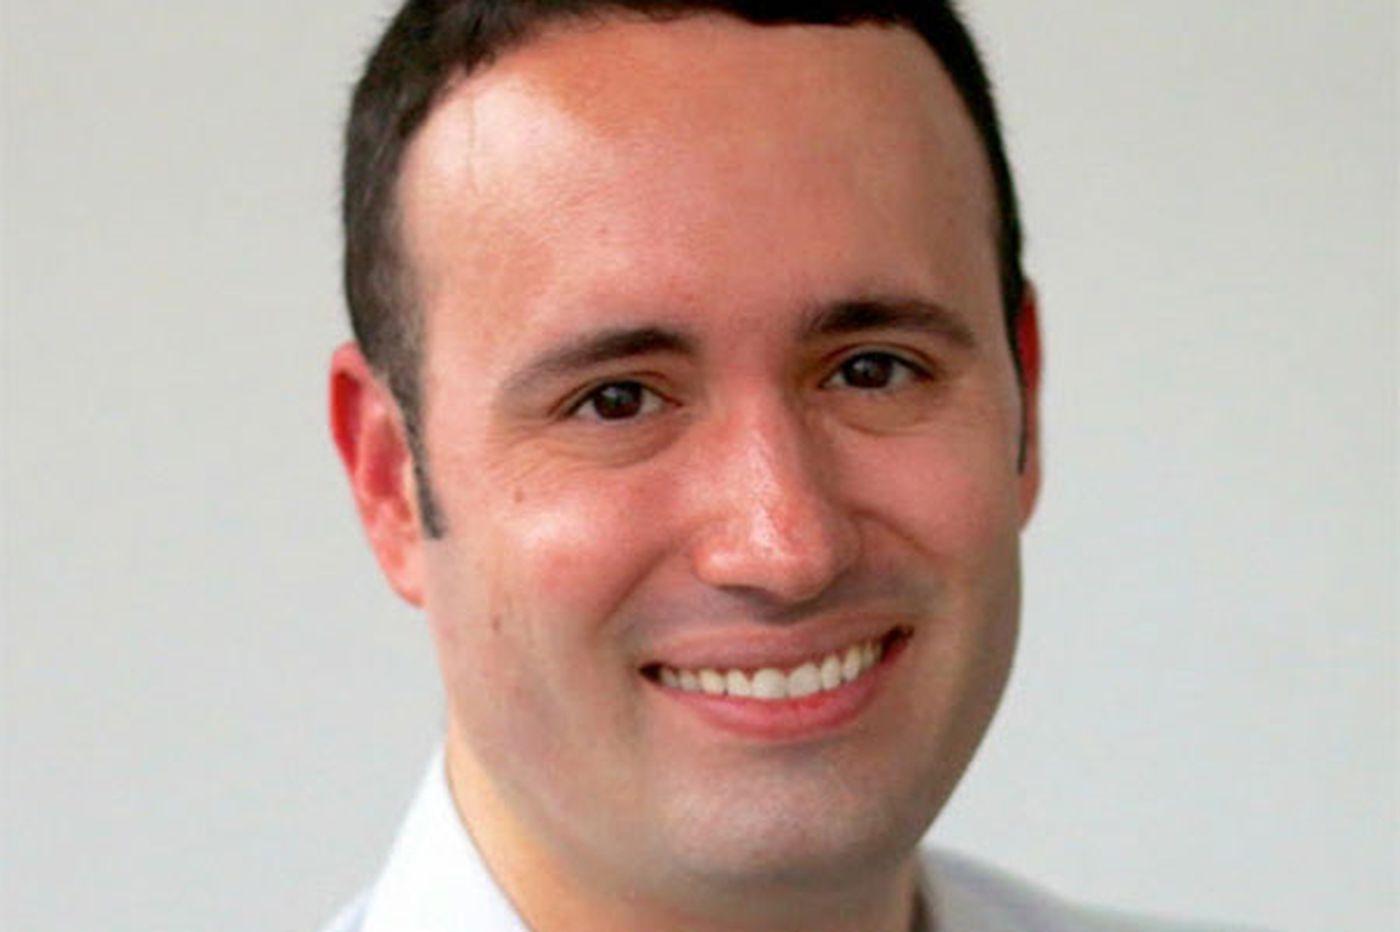 Daniel Ryan Reimold, 34, journalism teacher at St. Joseph's University